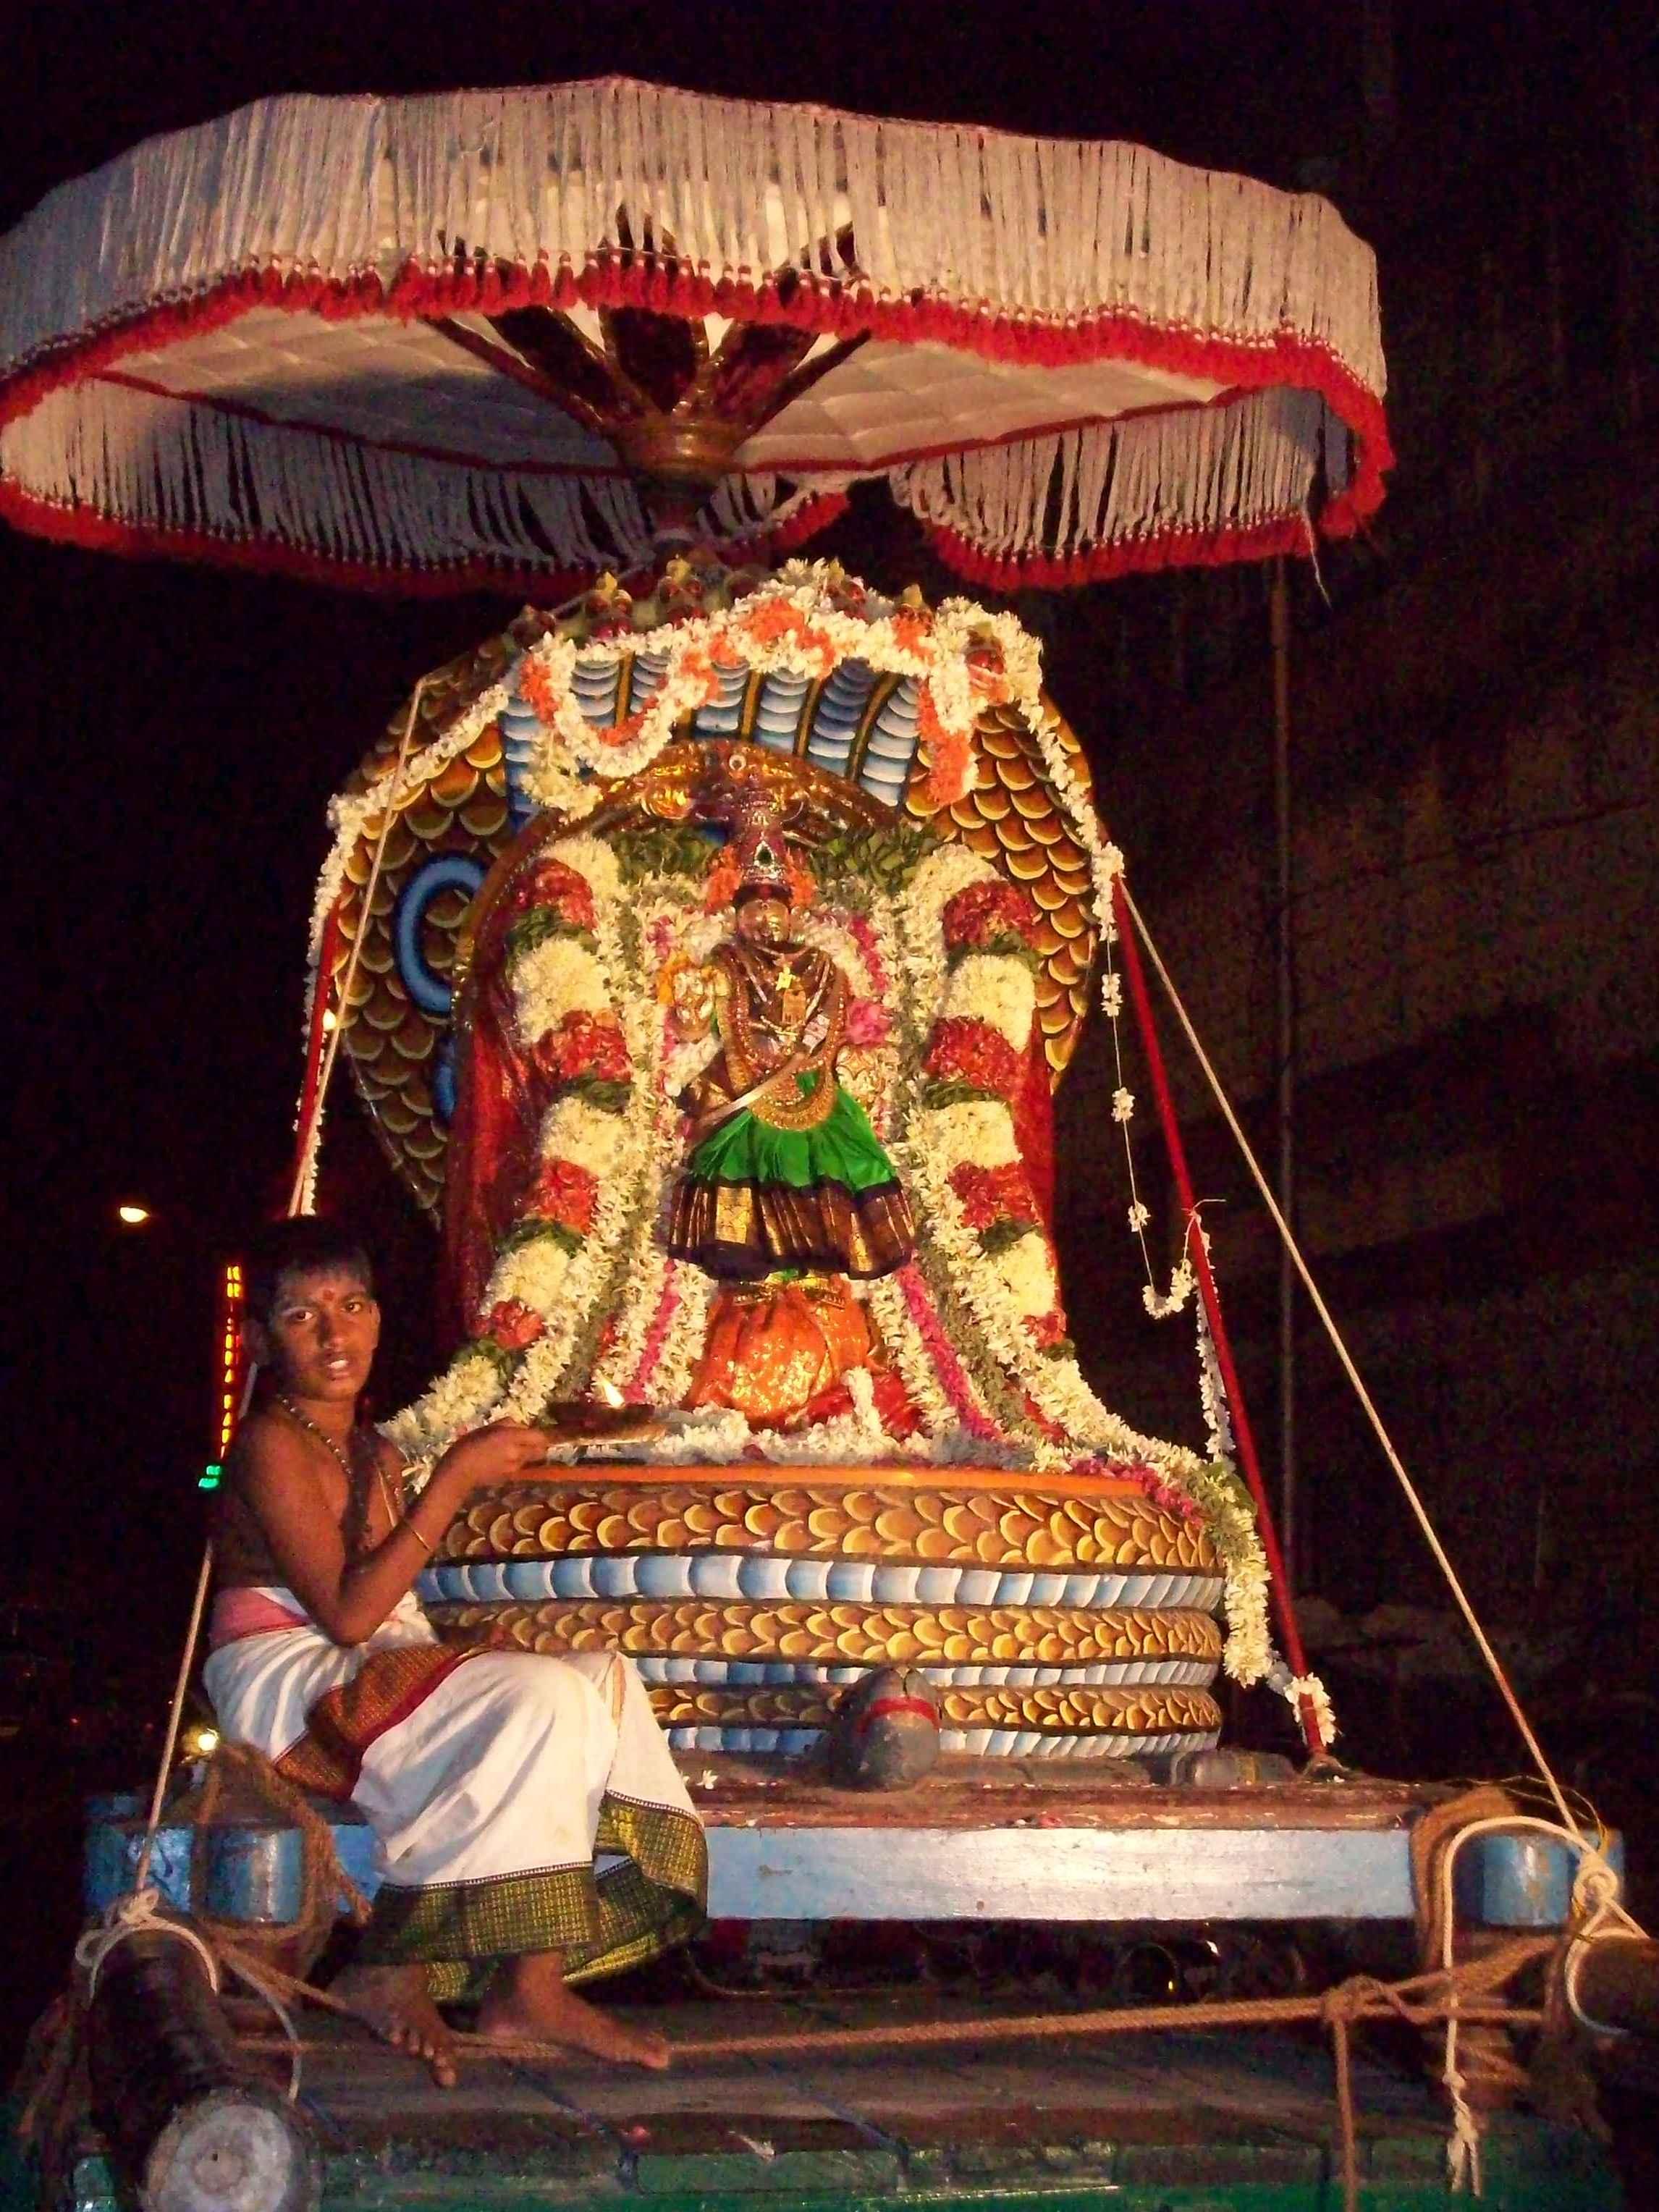 Ambaal-Kaamakshi-Naga-Vaganam-Velli-Eswarar-Sesha-Vaahanam